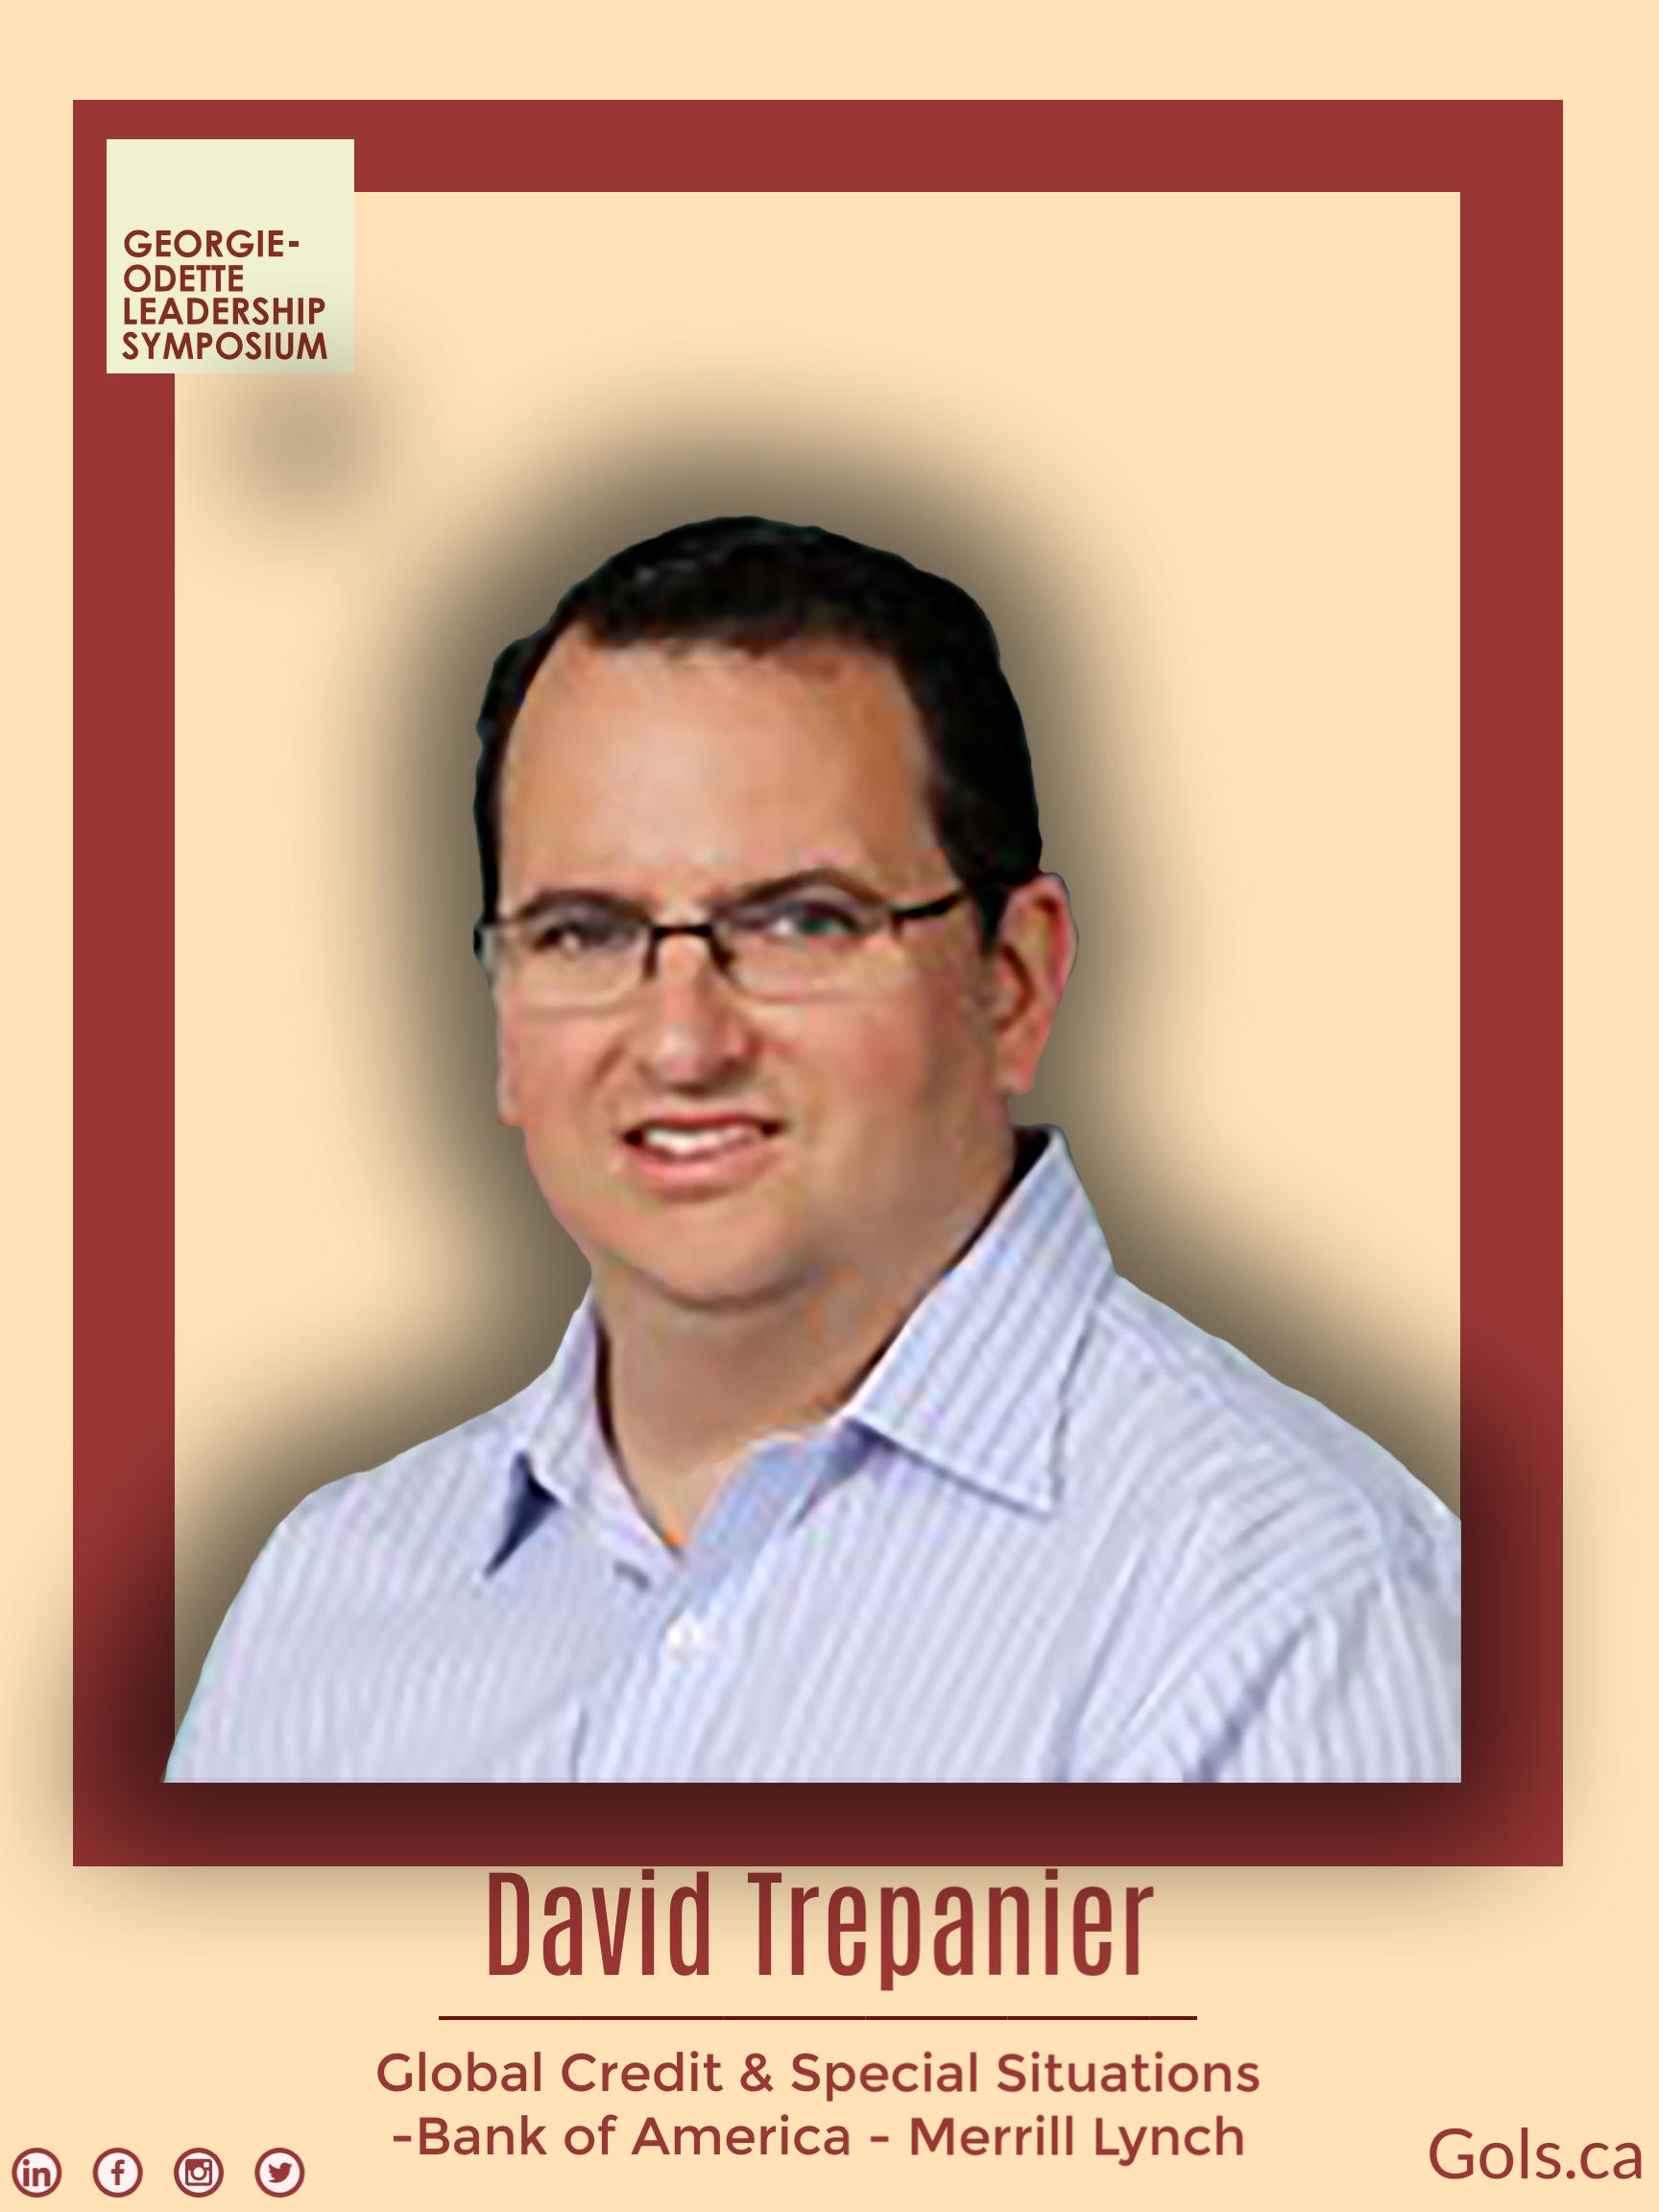 David Trepanier